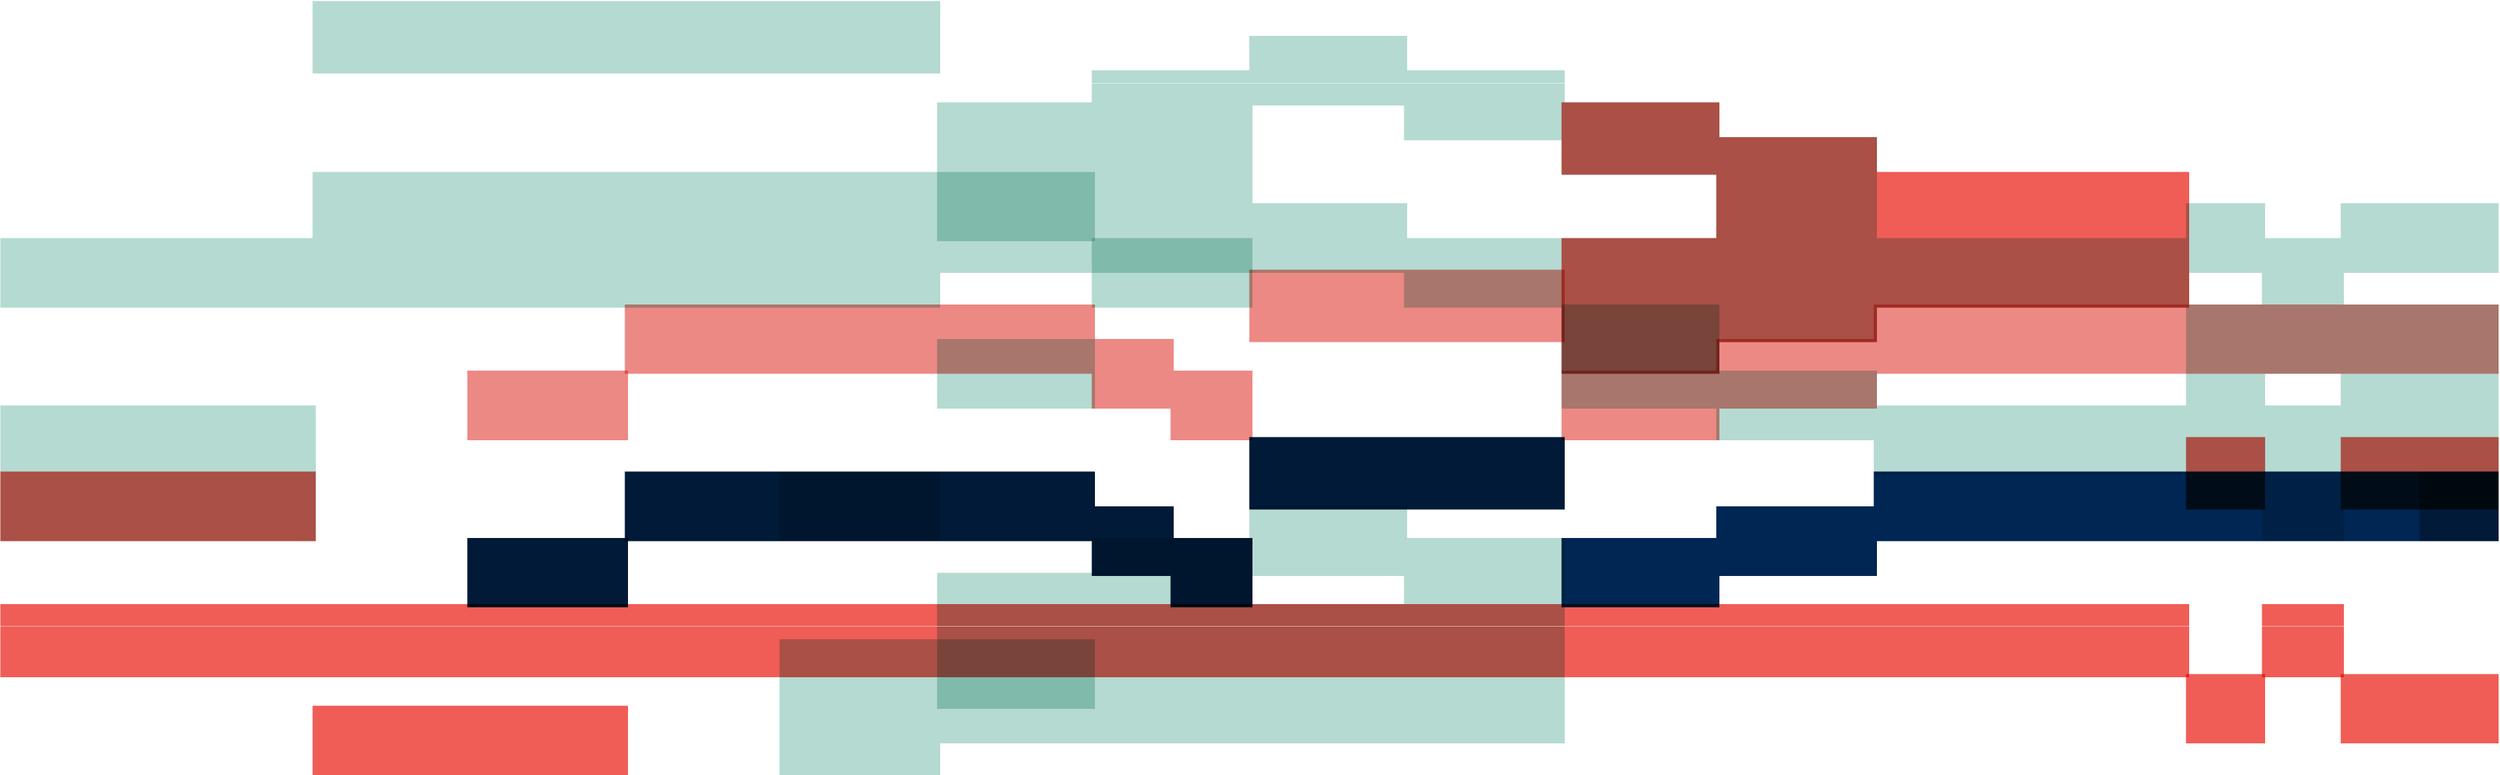 KatePeer_Designer_Strategist_London_England_Toronto_Branding_Editorial_Positioning_Ode-39.png